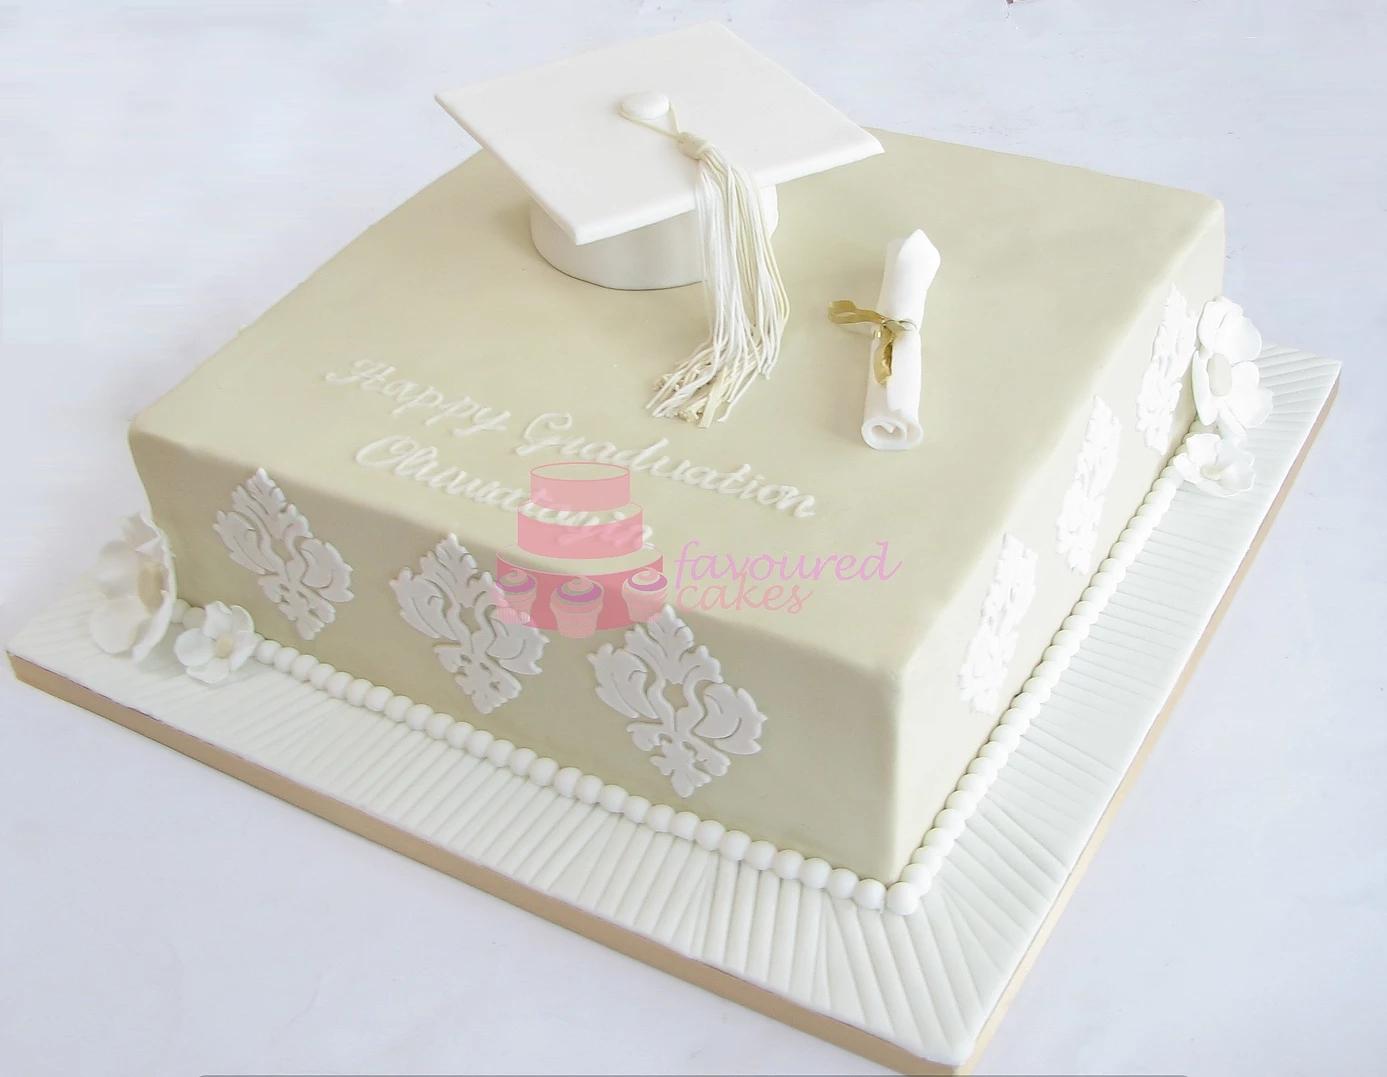 graduation cakes belvedere kent_3.jpg